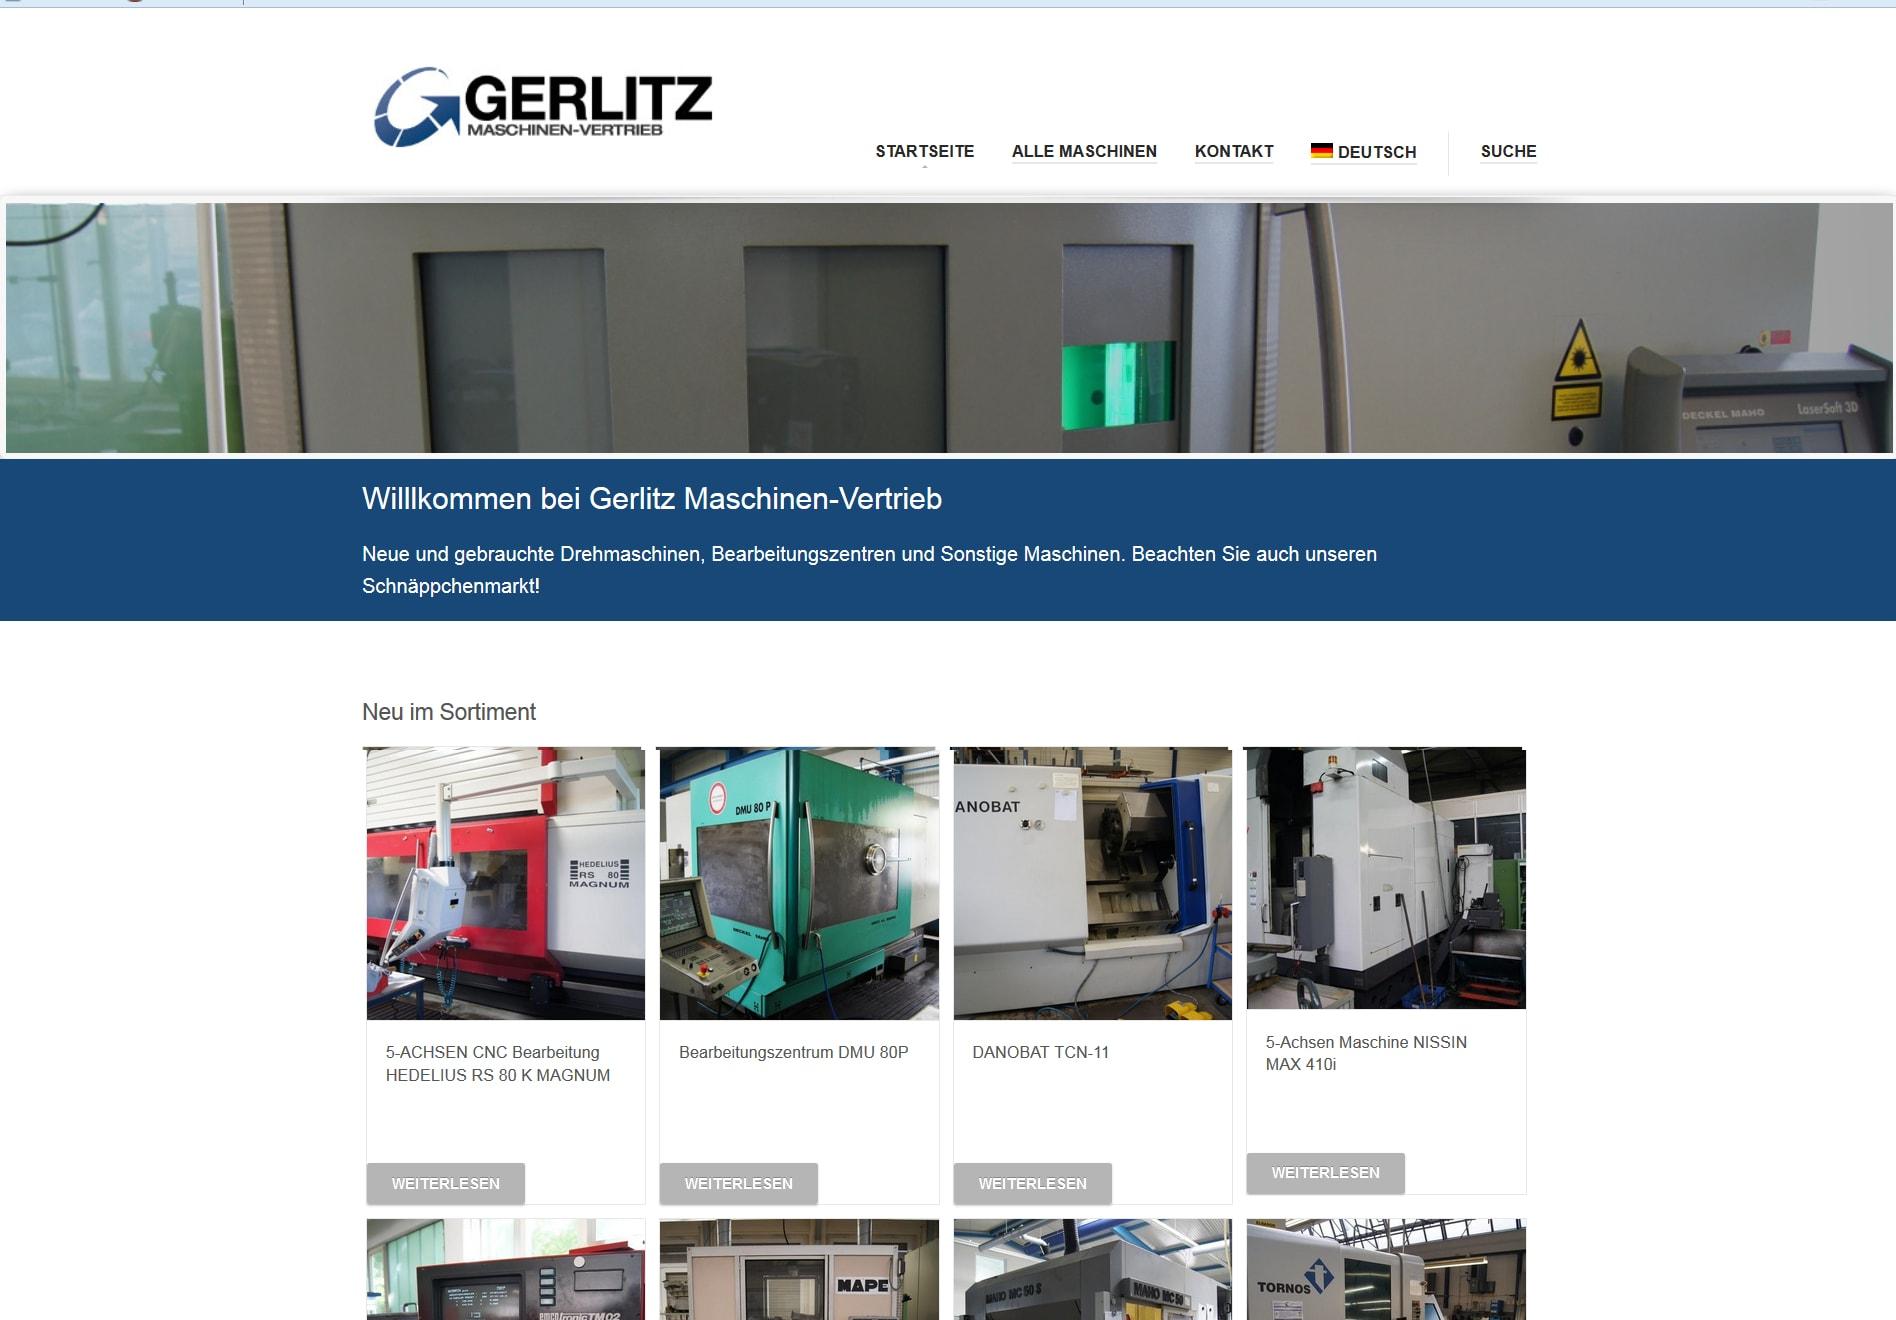 Gerlitz-Maschinen